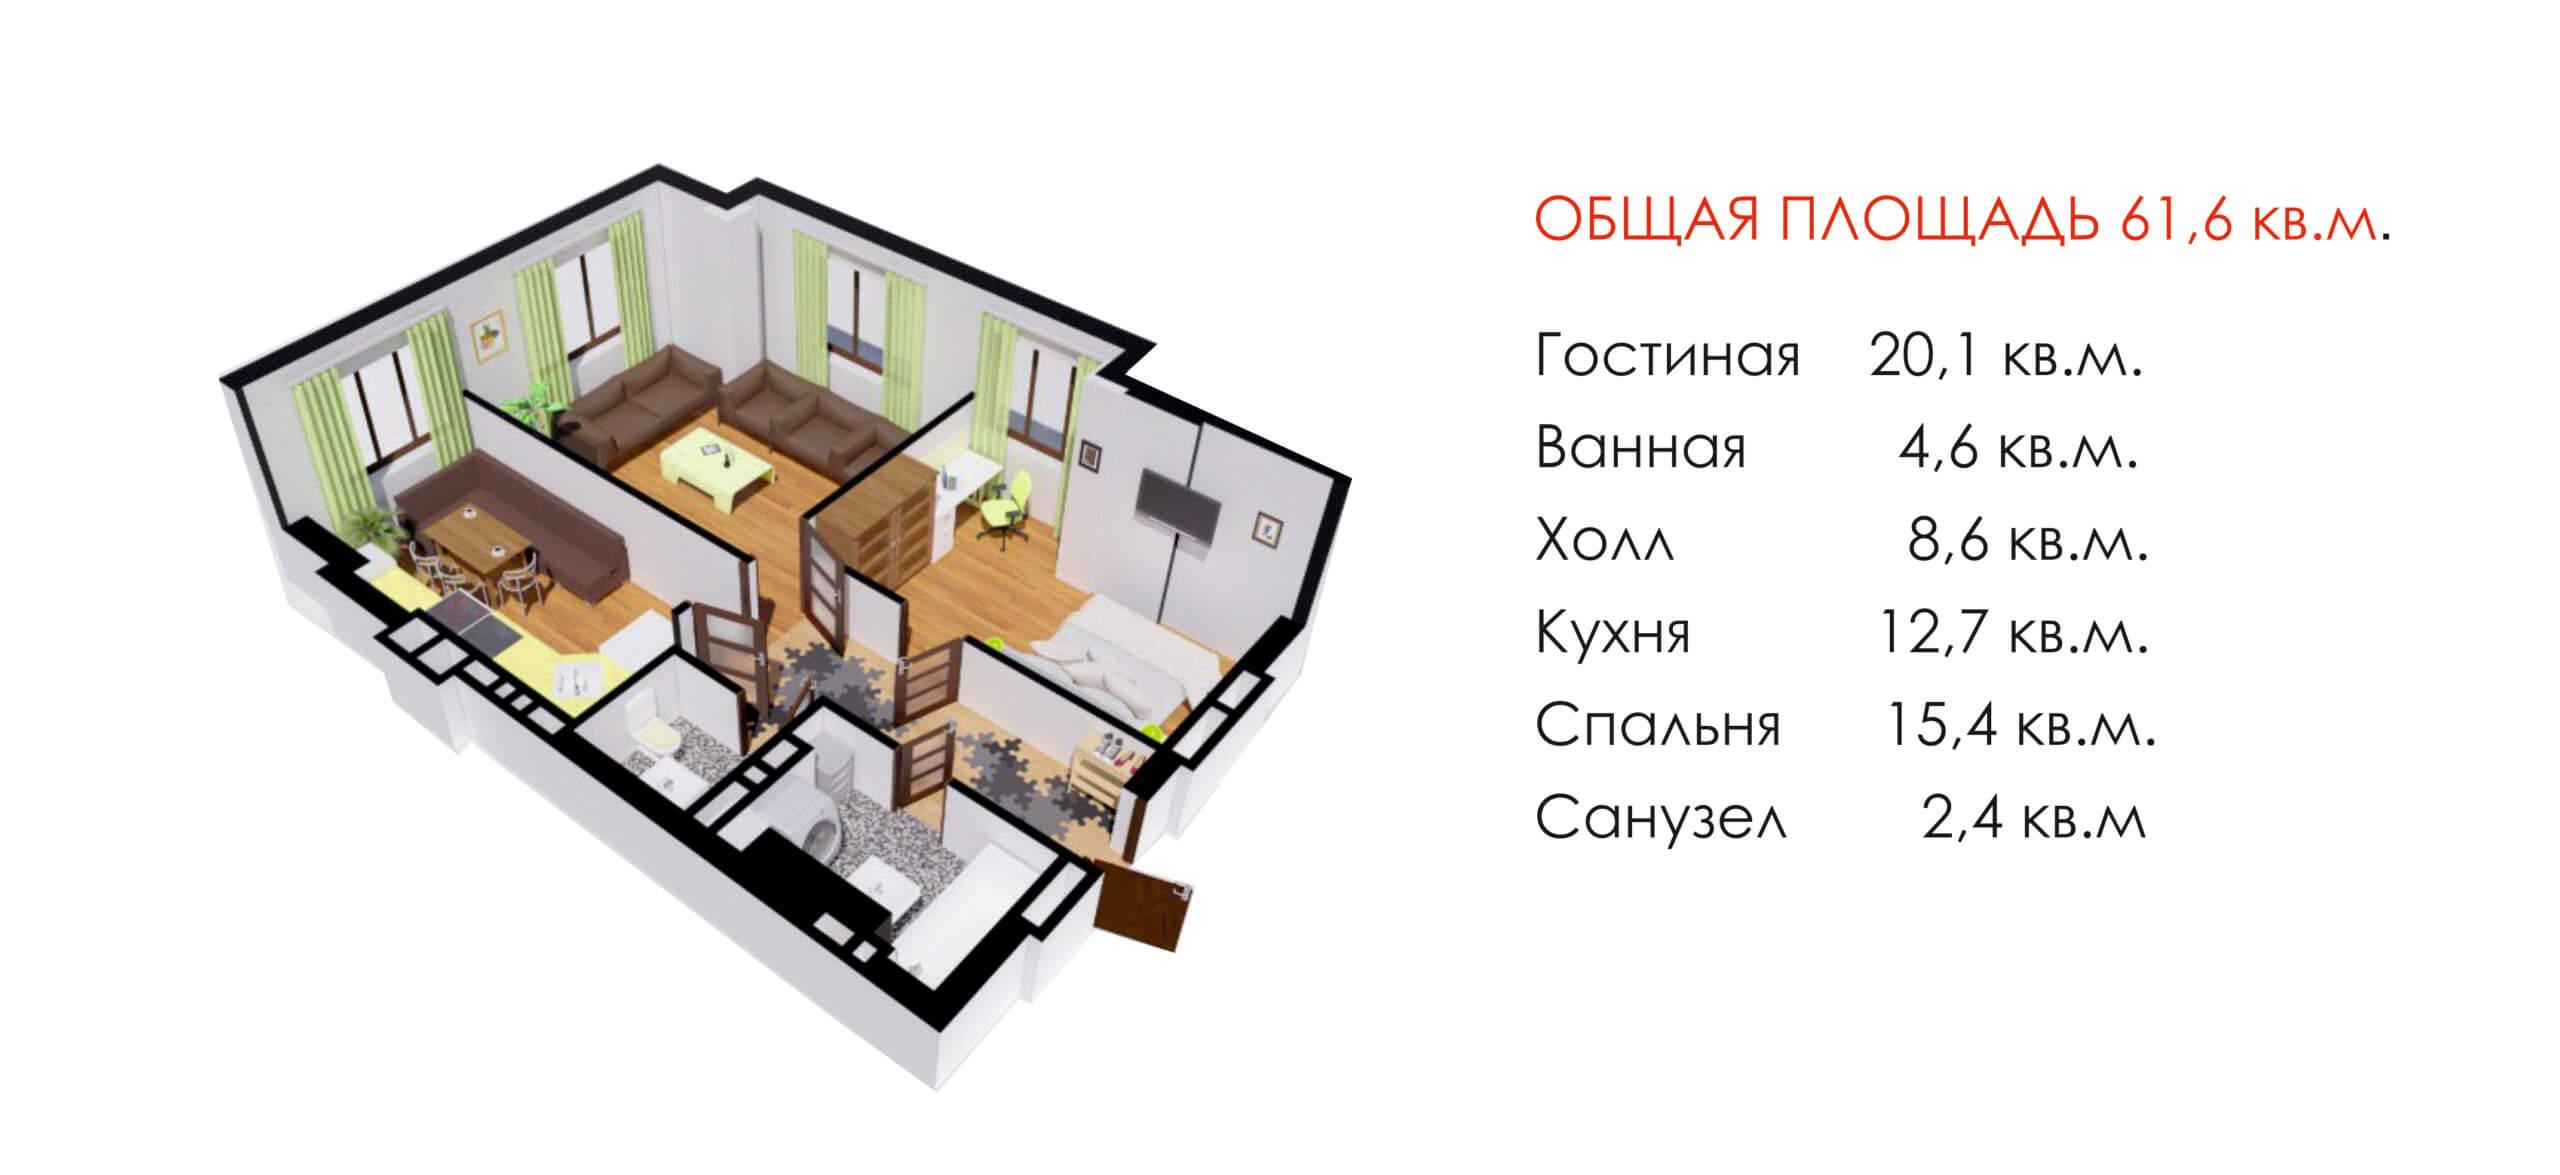 2-х комнатная квартира 61,6 кв.м.